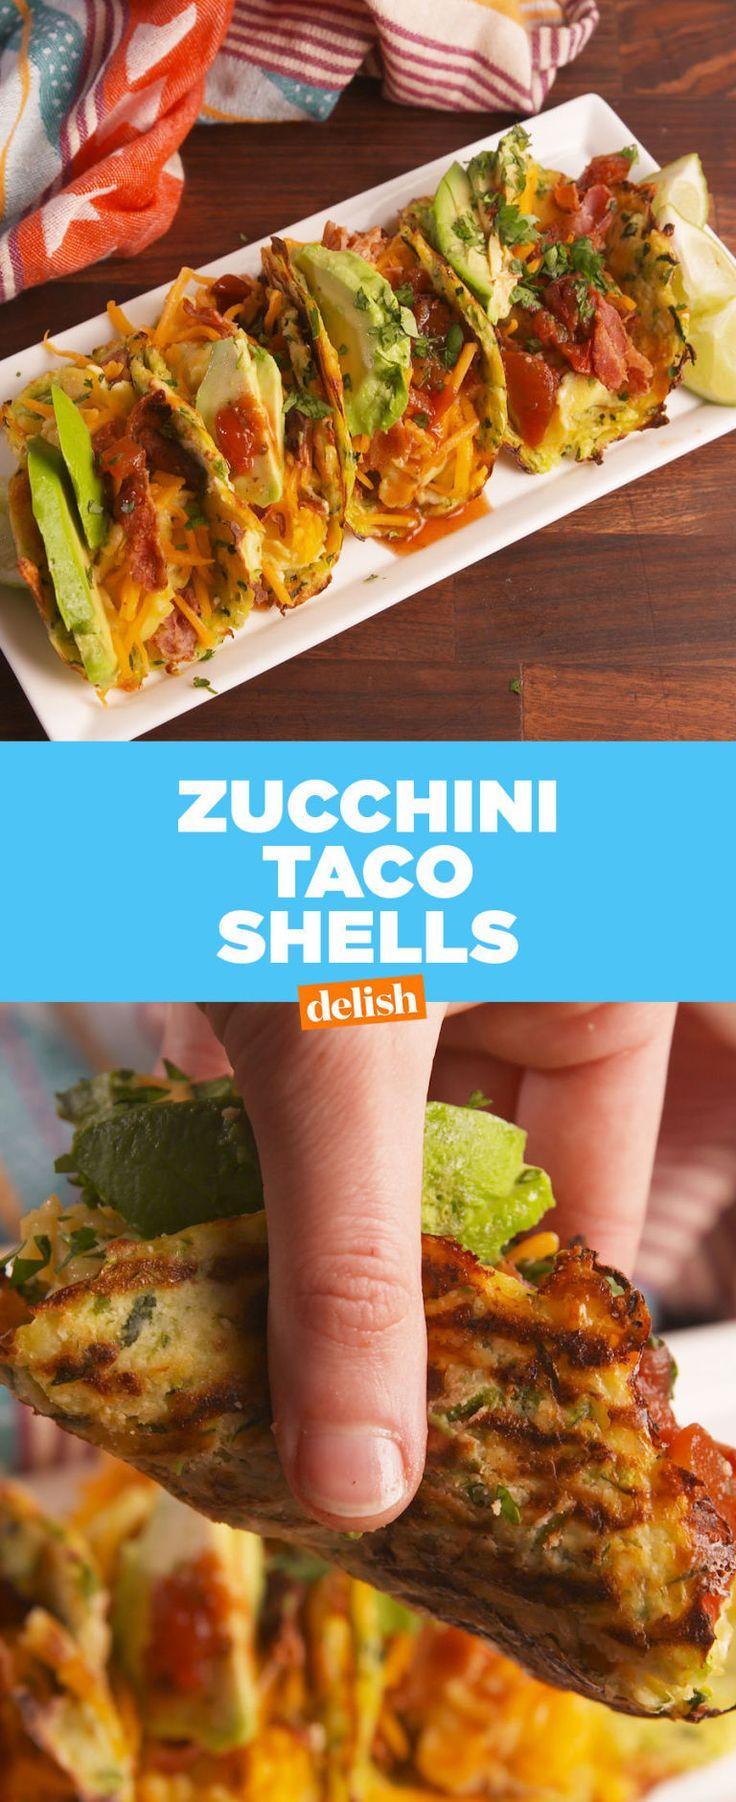 Zucchini Taco Shells Fix Your Healthy Diets Biggest Problem